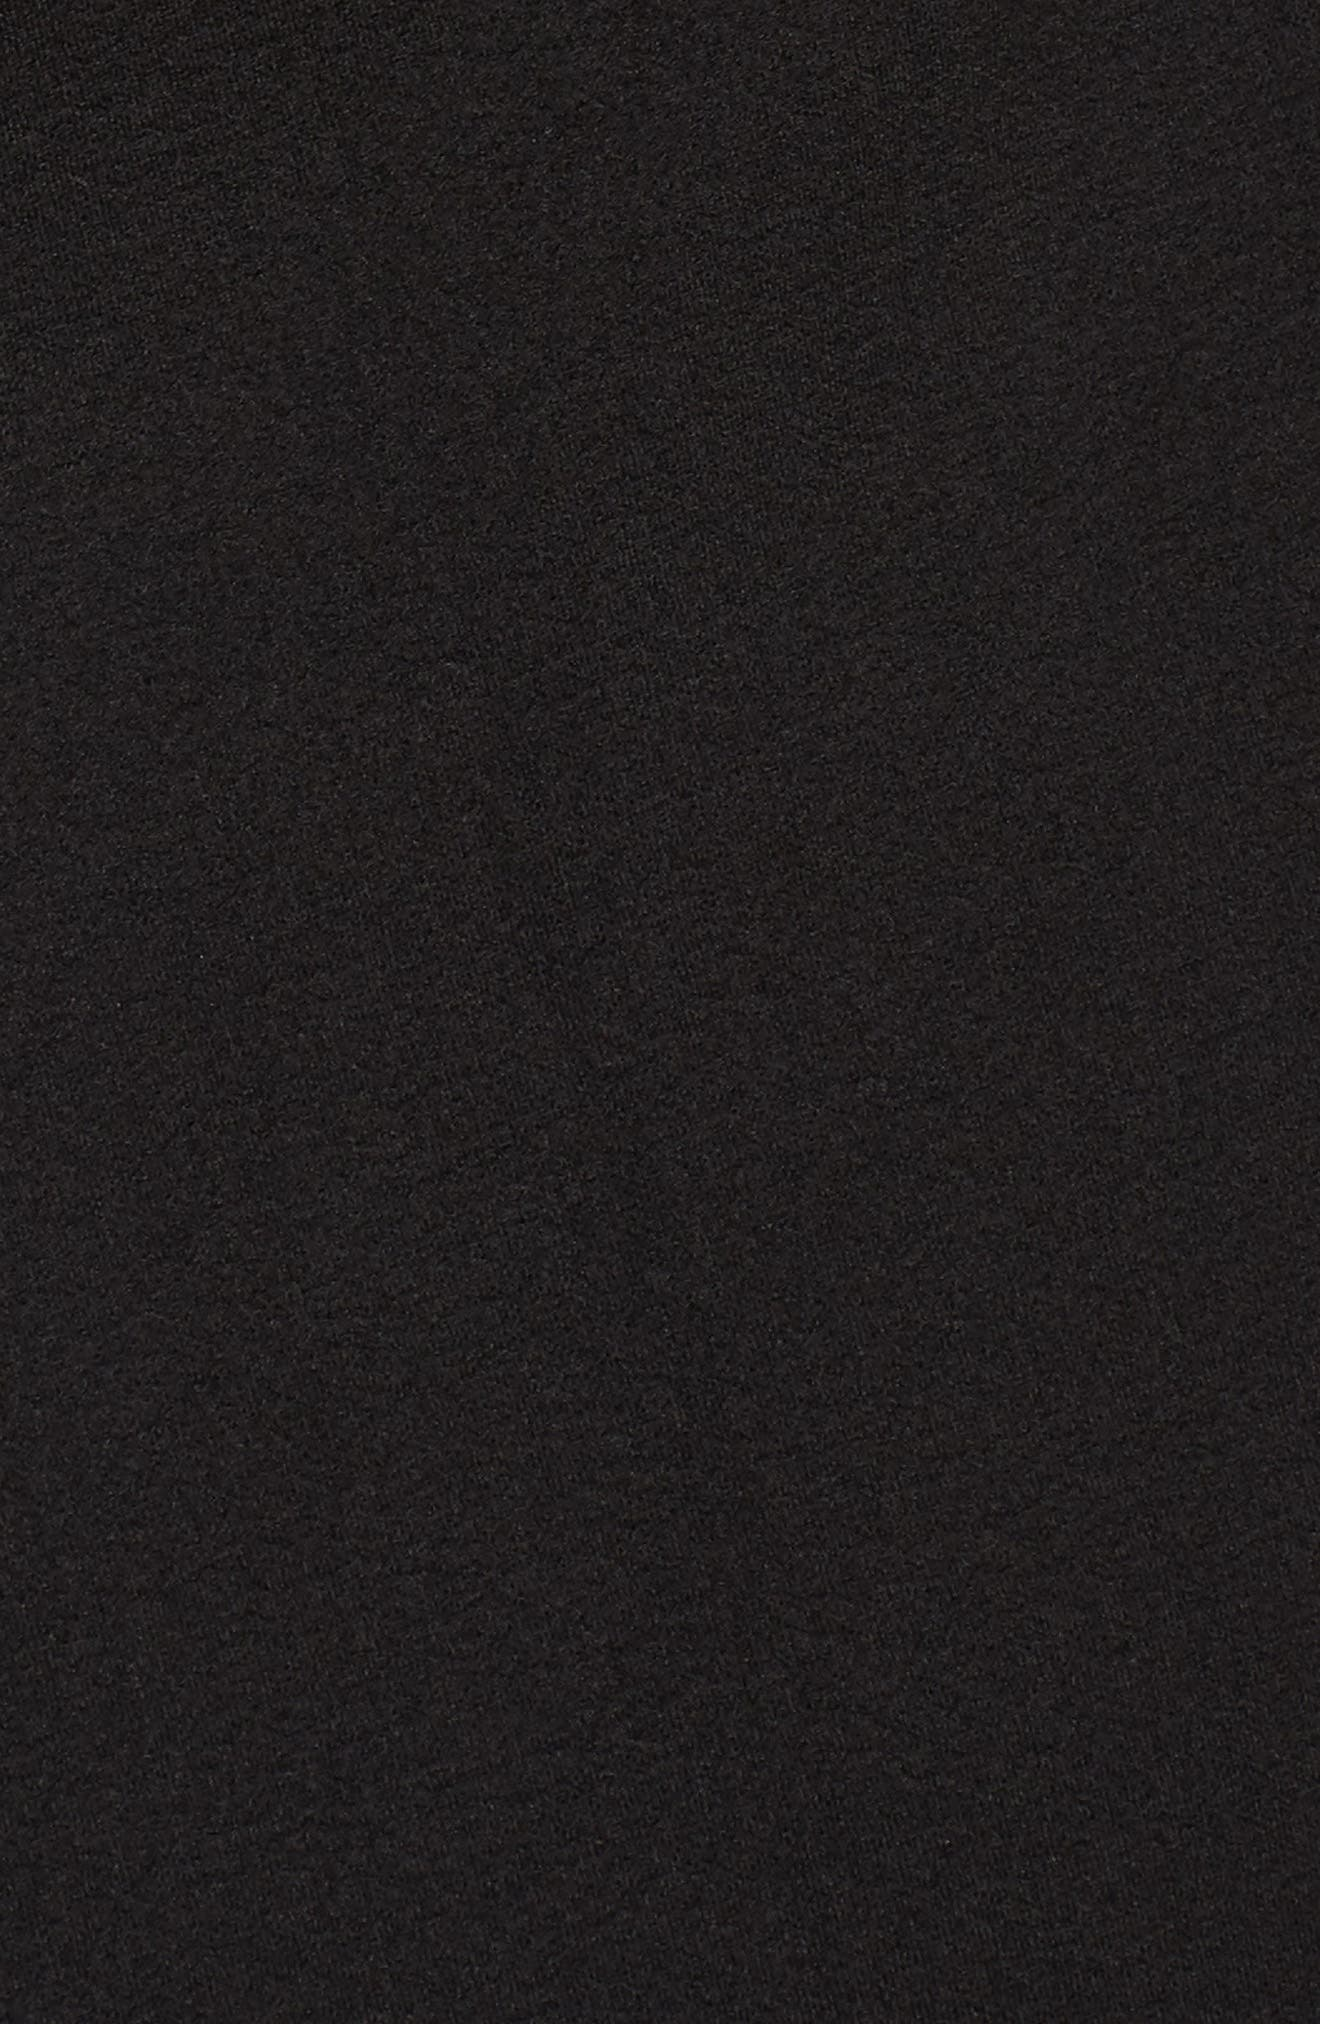 TAHARI, Ruched Surplice Crepe Sheath Dress, Alternate thumbnail 6, color, BLACK